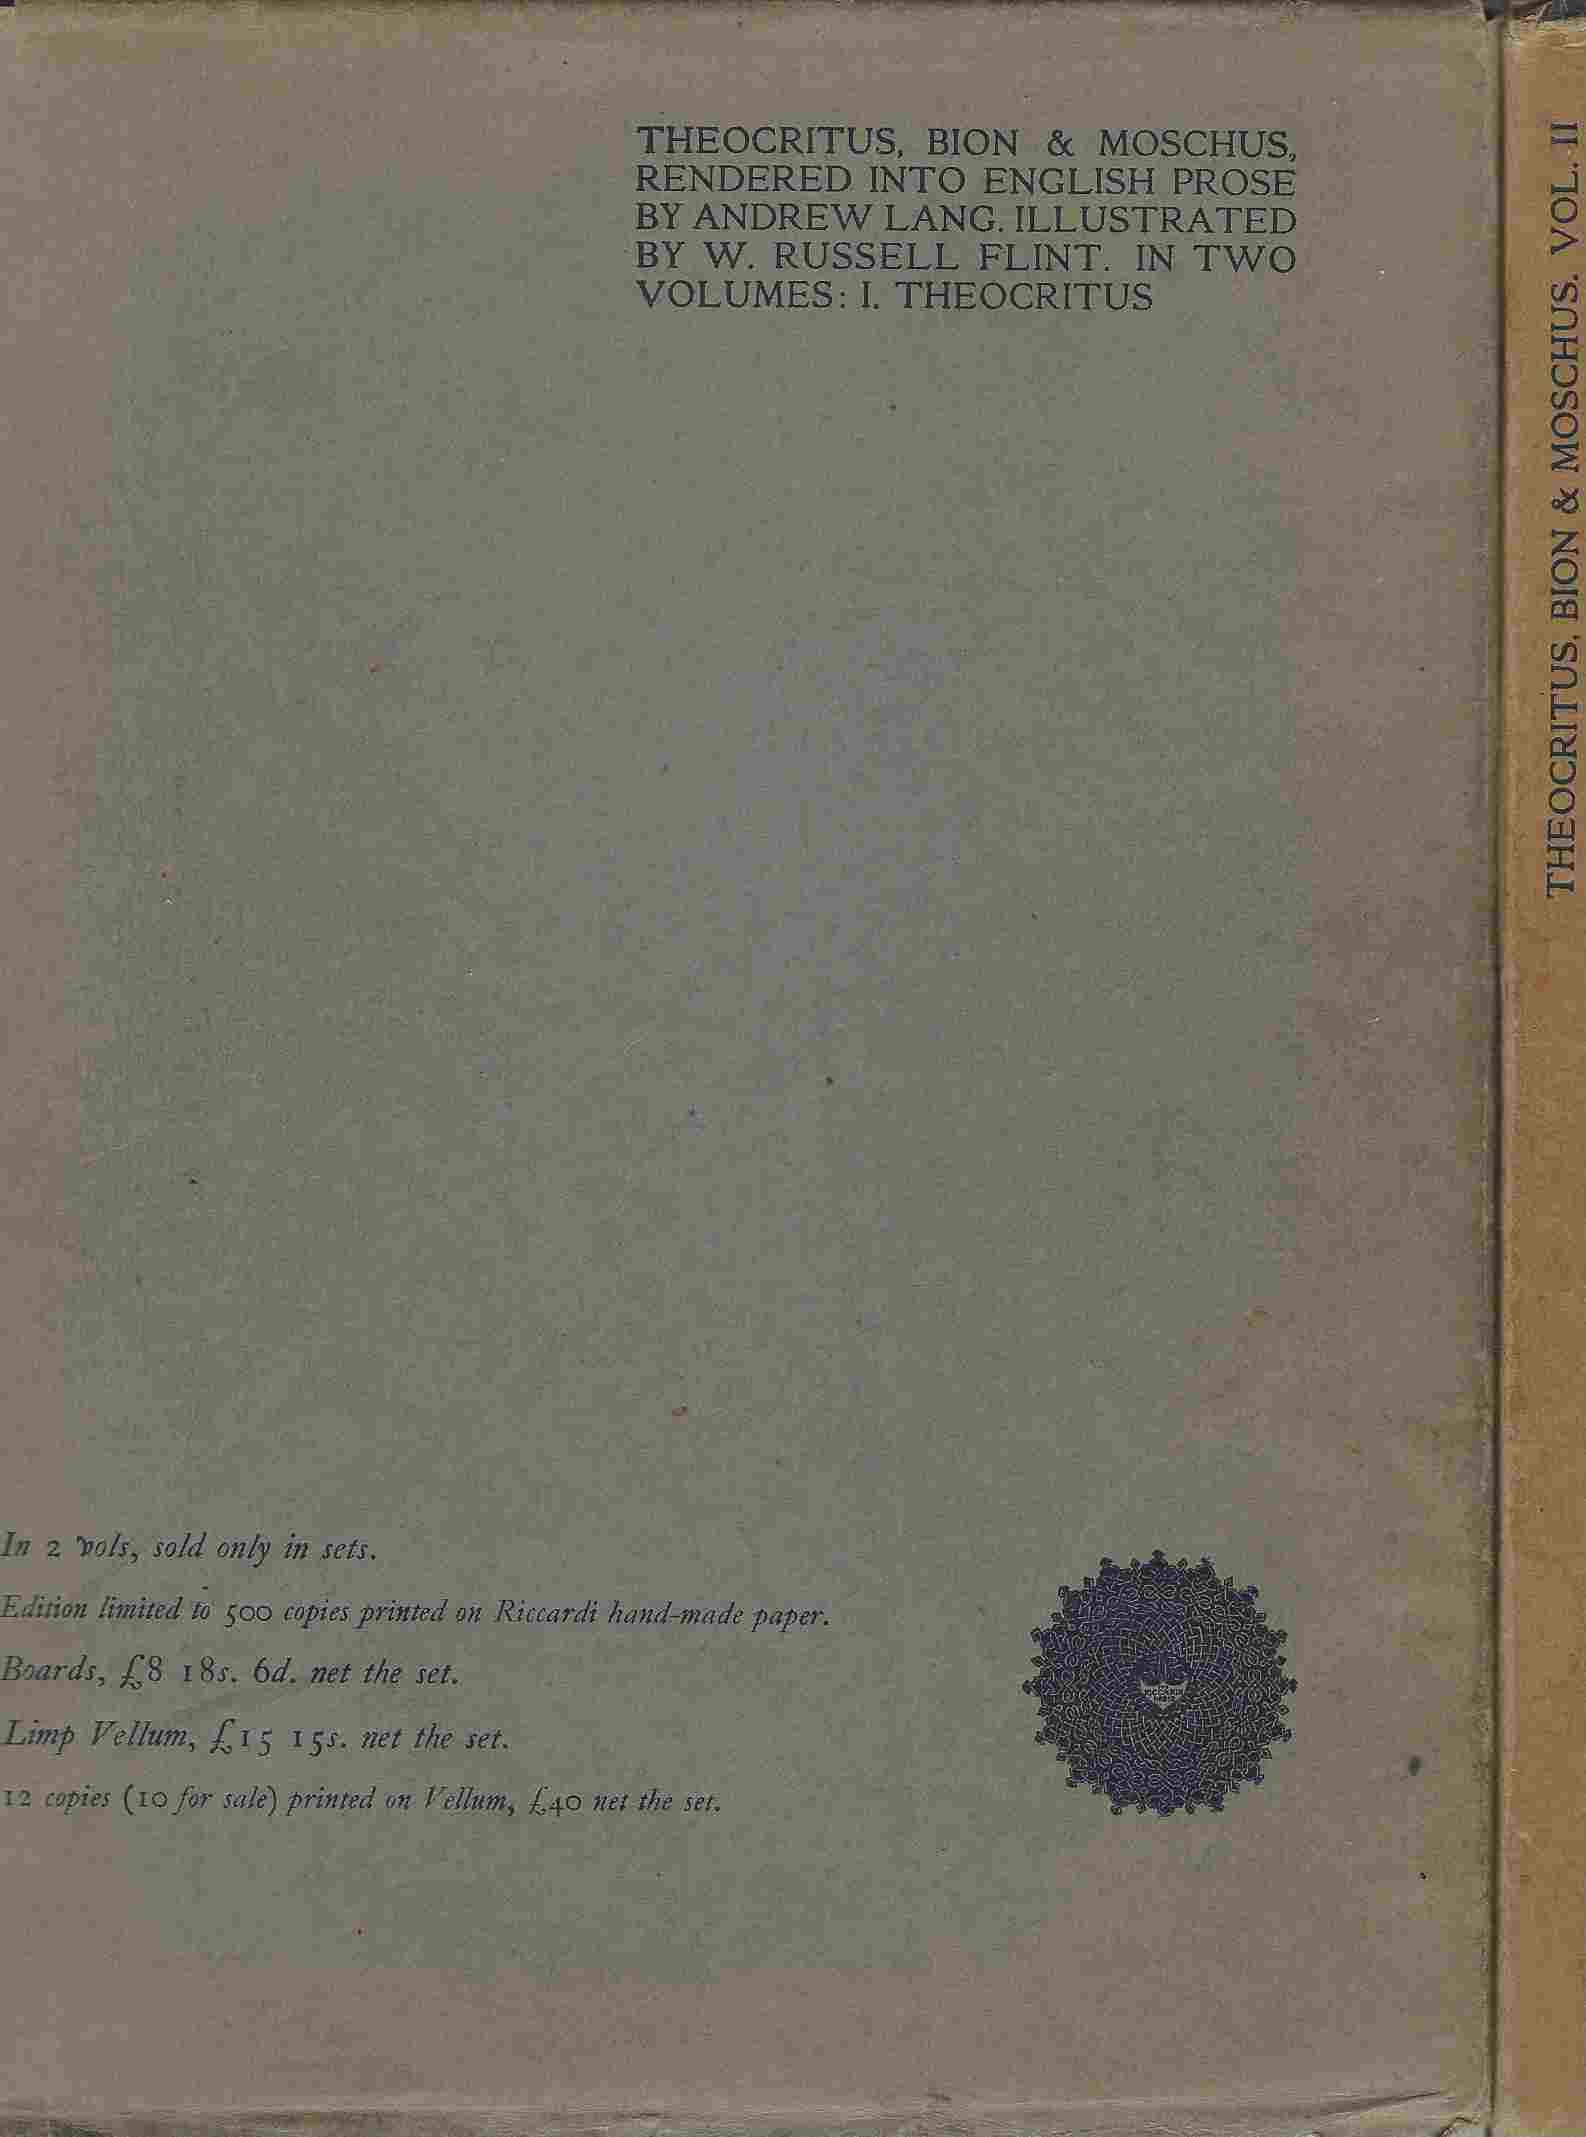 The Idyls of Theocritus [2 volumes; volume 1, Theocritus, volume 2, Bion and Moschus].